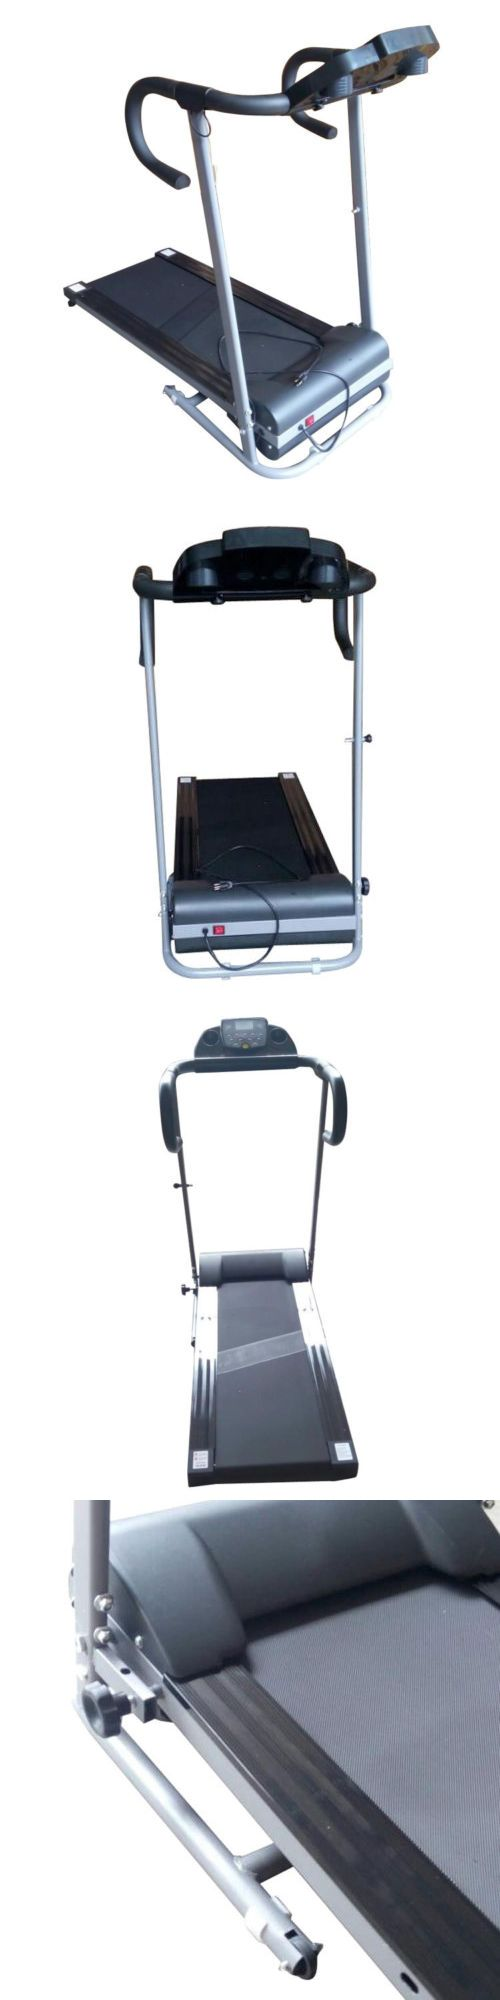 Treadmills 15280: Folding 500W Electric Treadmill Power Motorized Jogging Running Machine BUY IT NOW ONLY: $172.49